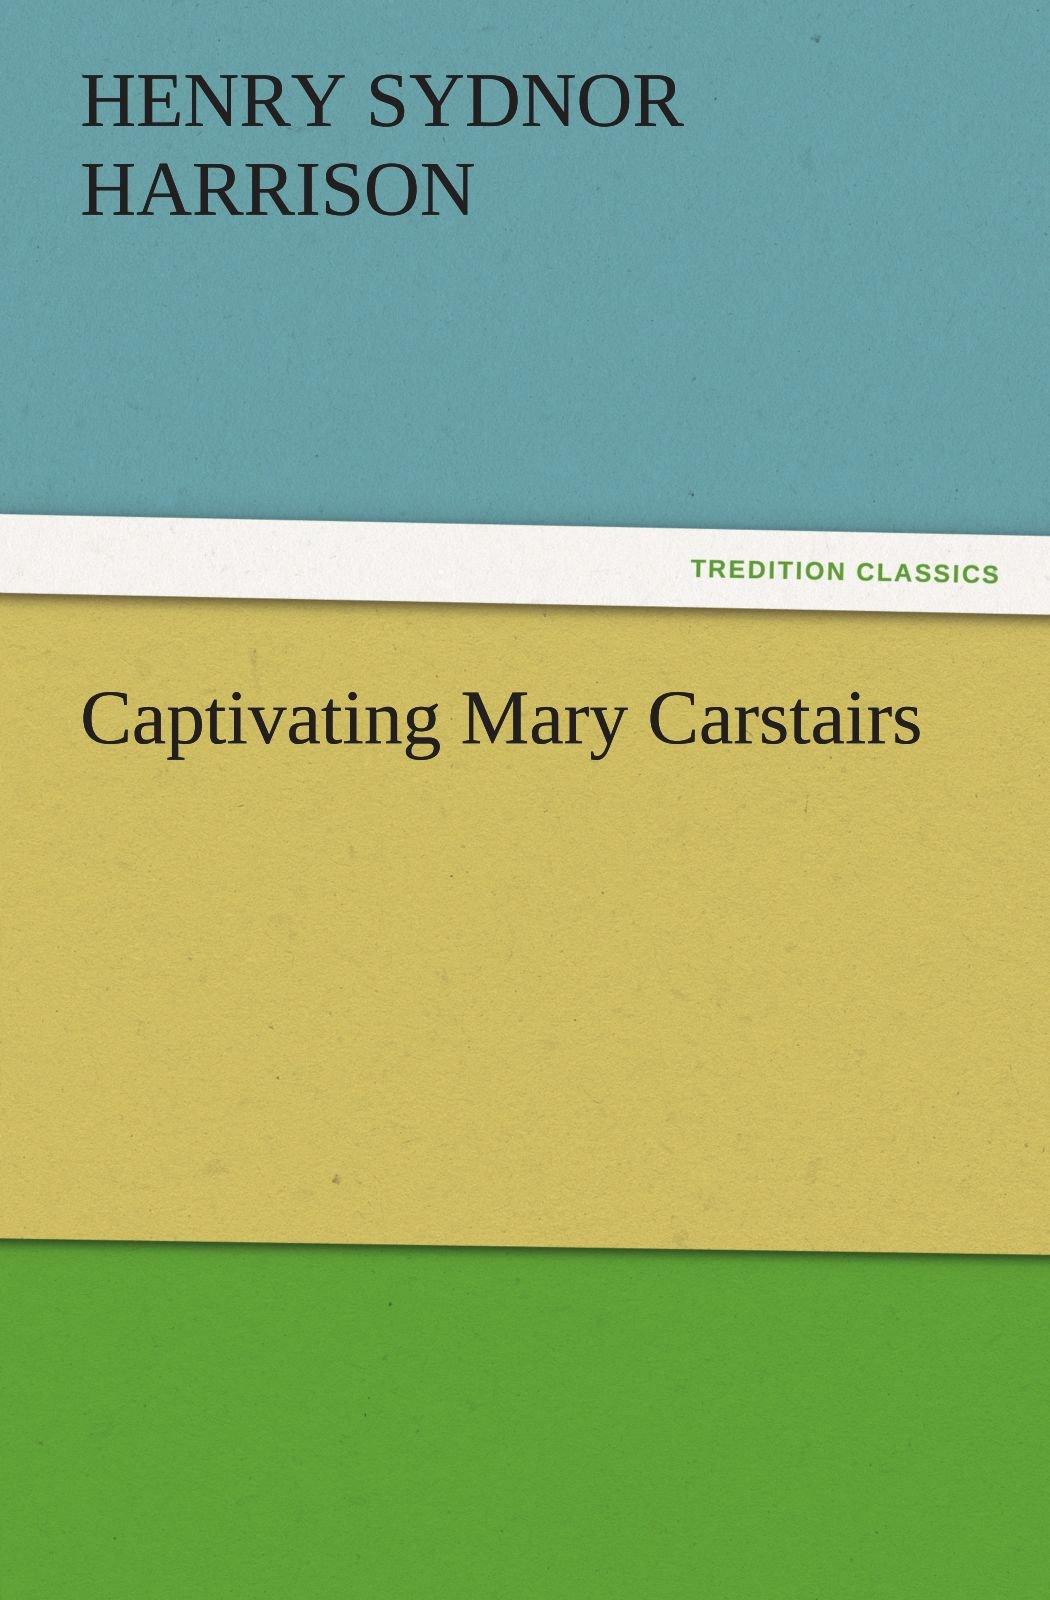 Download Captivating Mary Carstairs (TREDITION CLASSICS) pdf epub